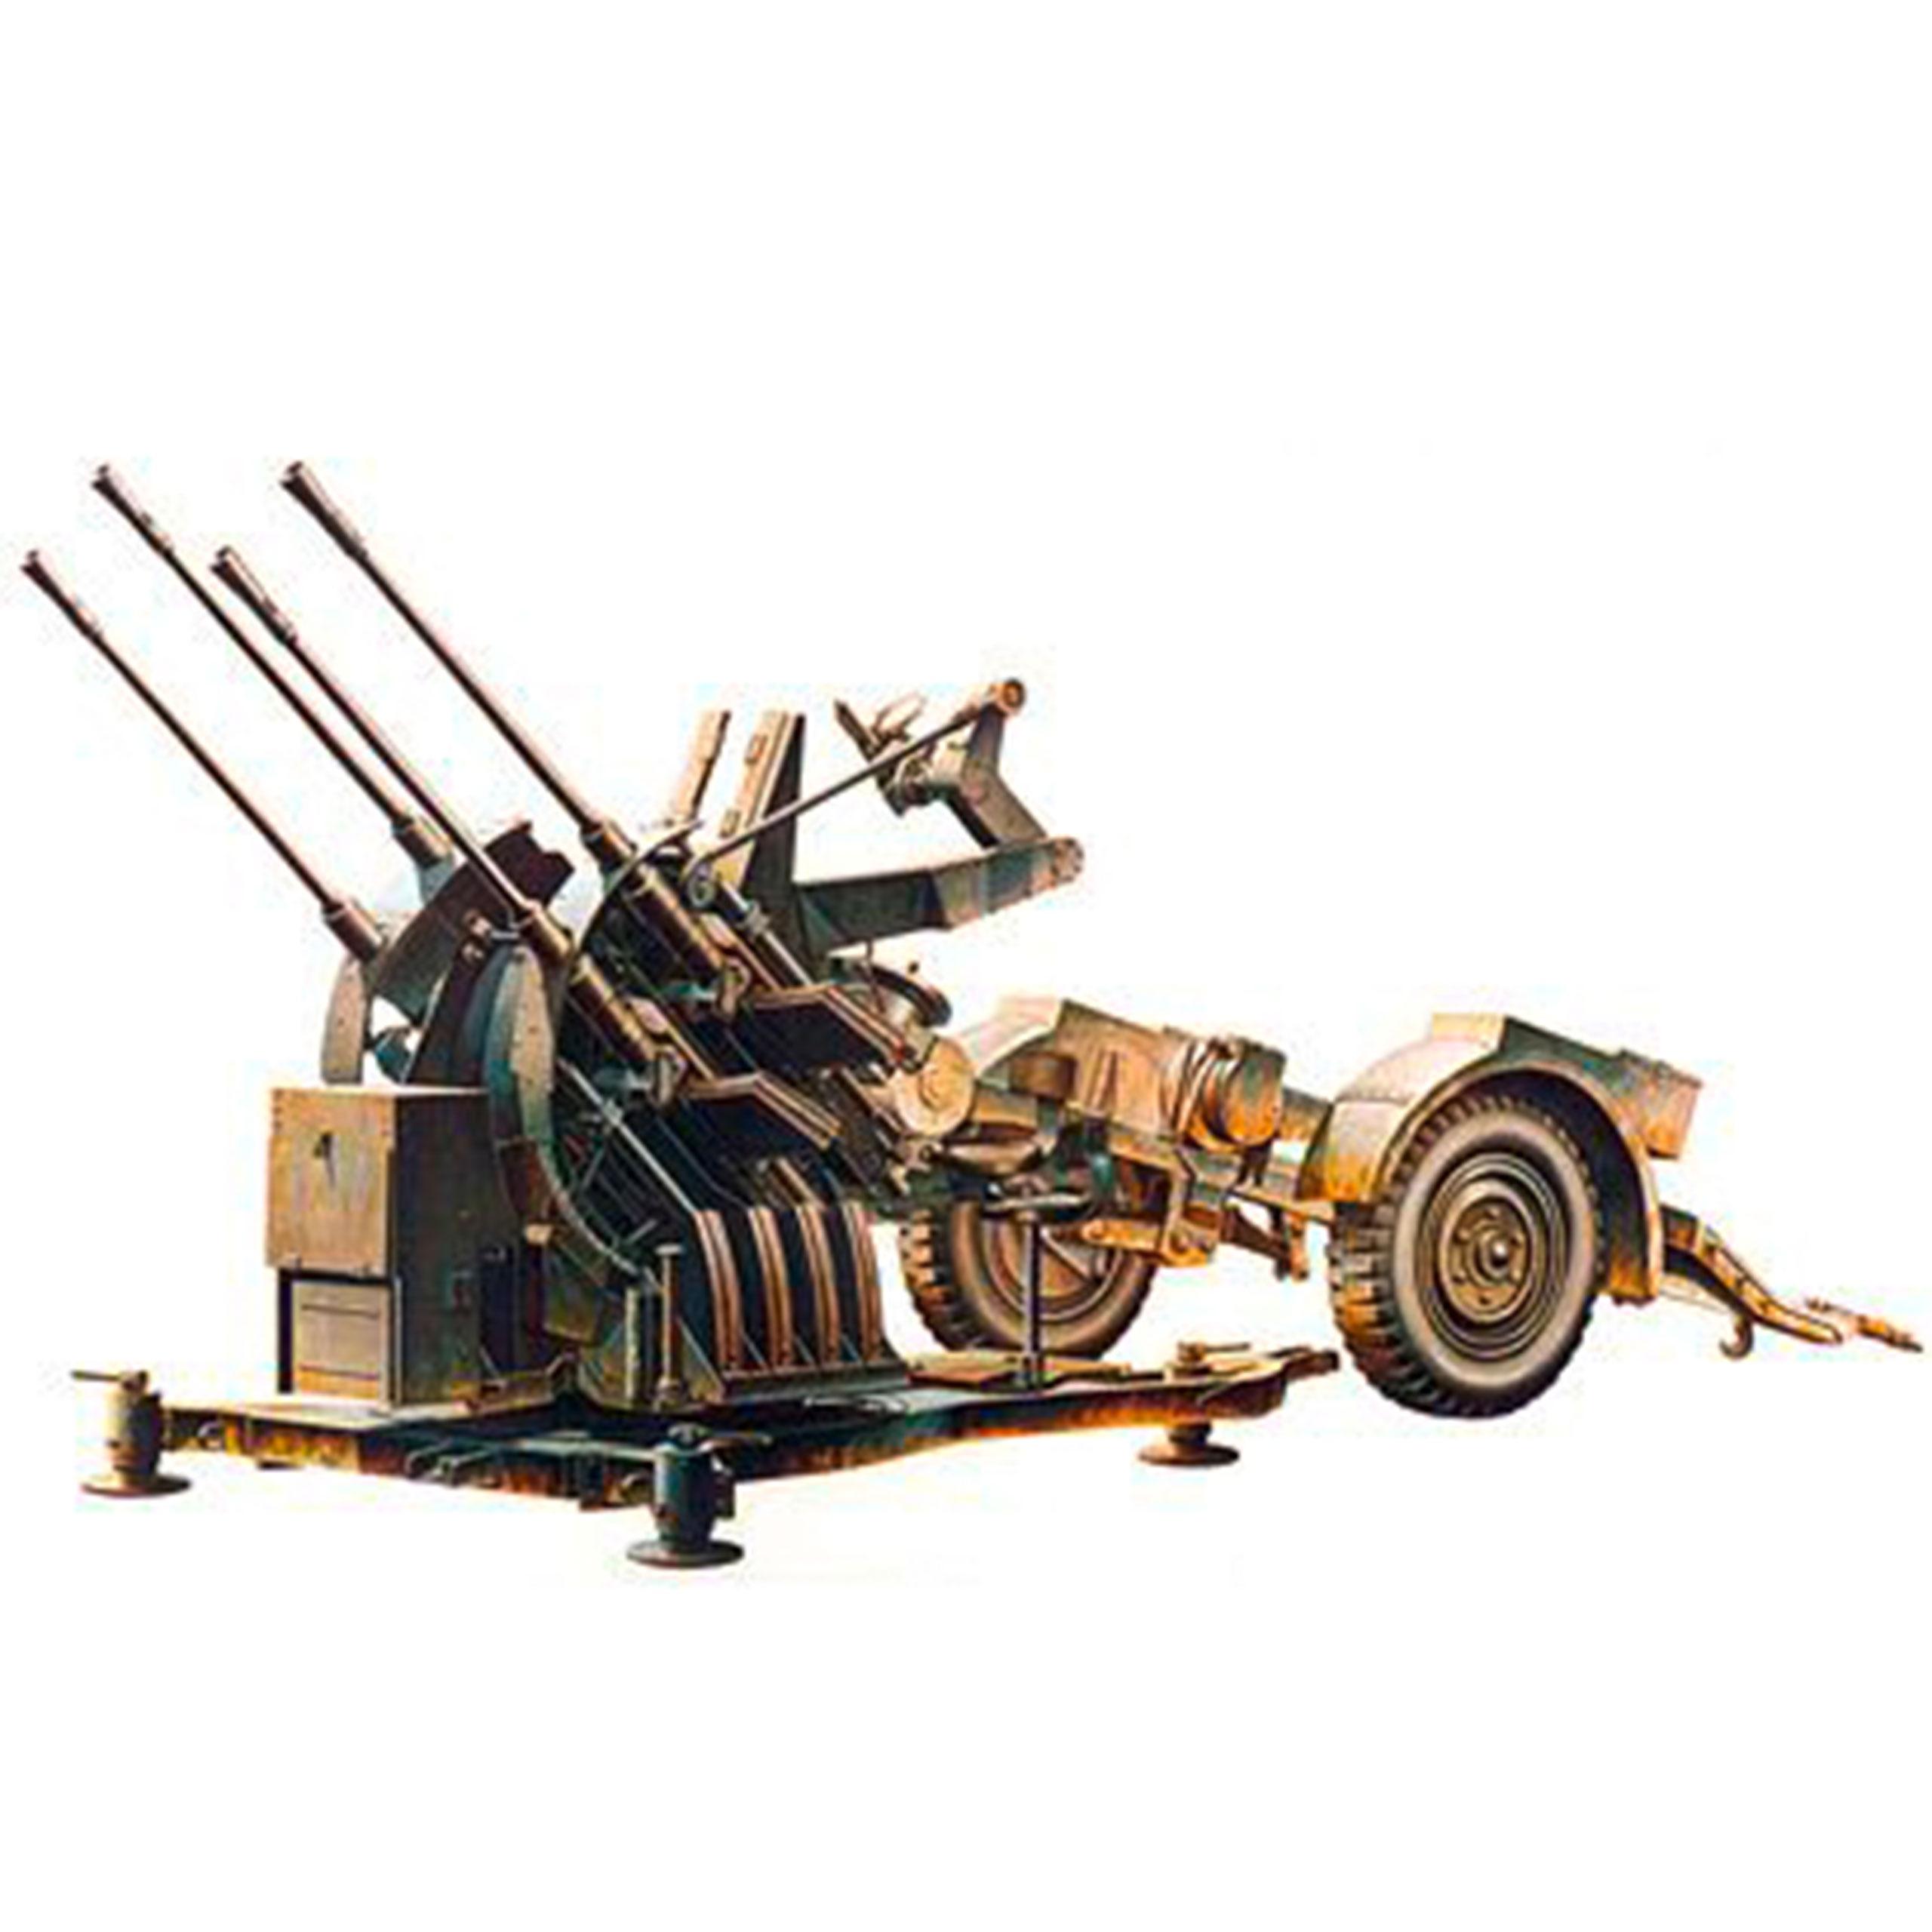 Tamiya 1:35 WWII Dt. 20mm FLAKVIERLING 38 SDAH 52 2CM 300035091